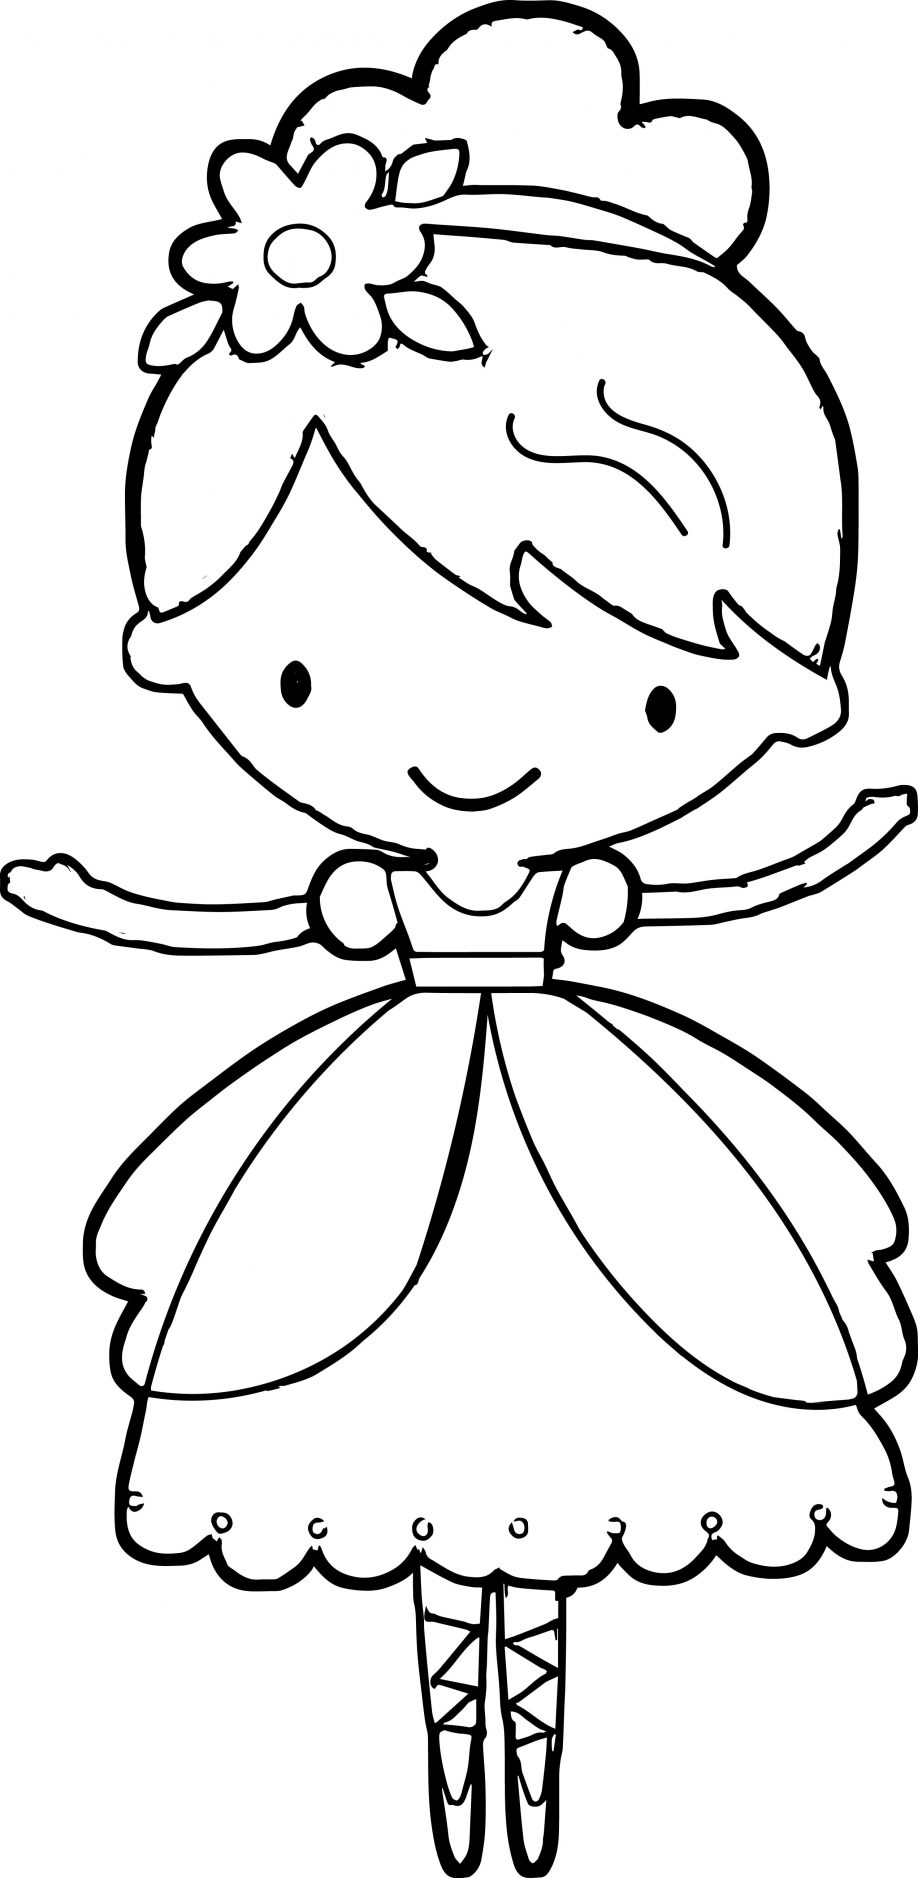 Ballerina Shoes Drawing at GetDrawings | Free download